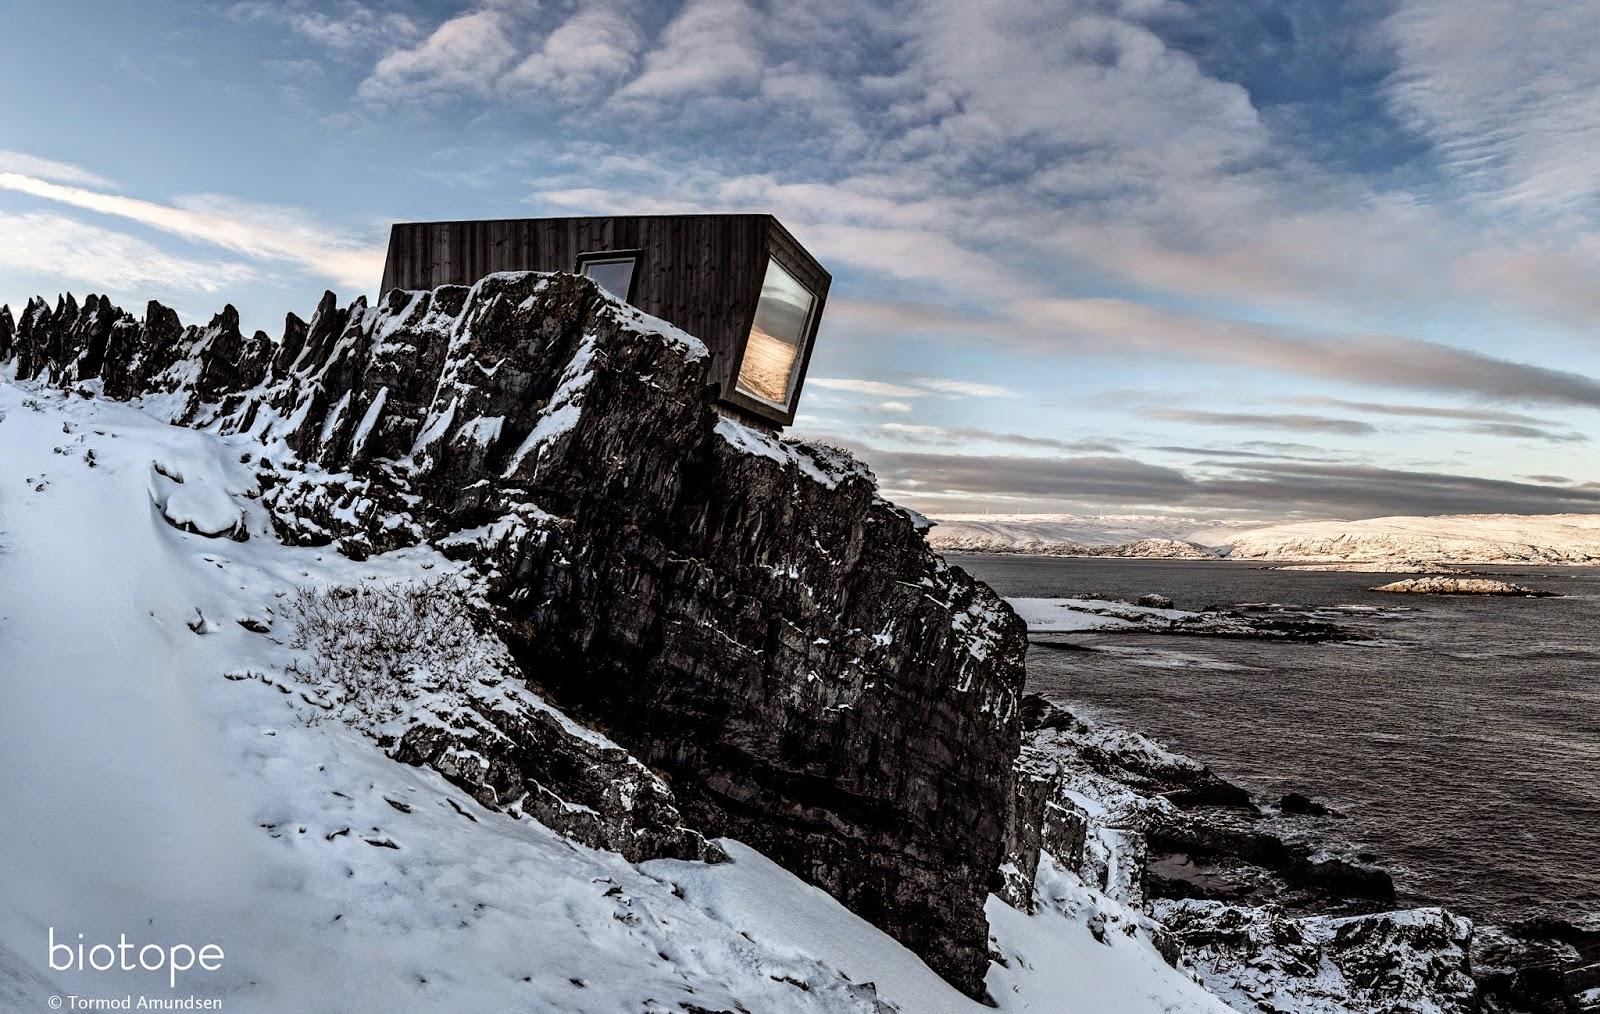 Kongsfjord Veidnes cliff bird hide wind shelter Oct31st 2014 med res - sign Amundsen © Biotope.jpg